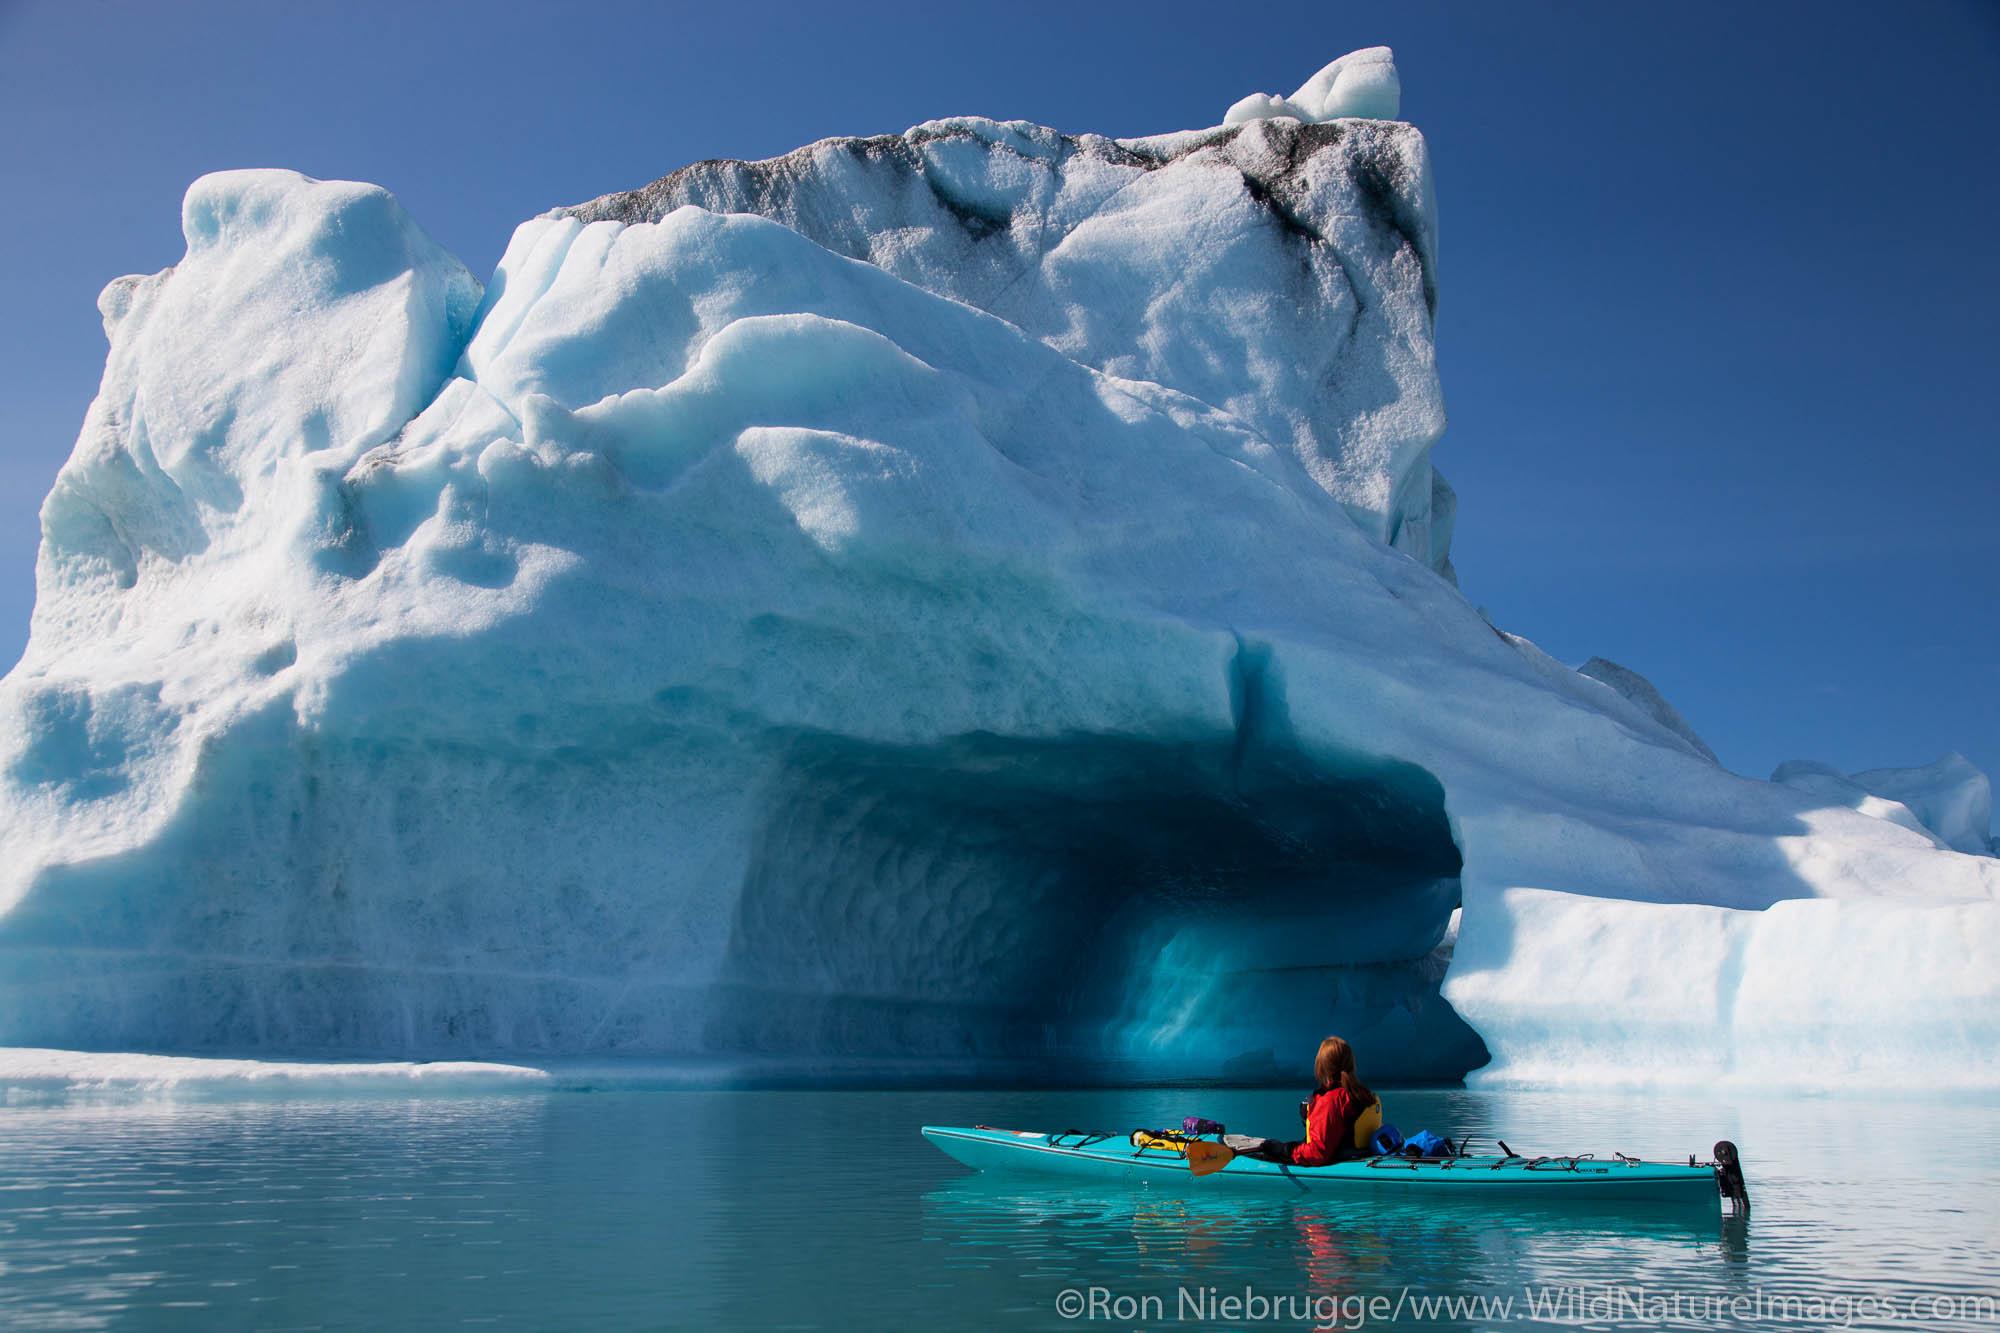 Kayaking in Bear Lagoon, Kenai Fjords National Park, near Seward, Alaska. (model released)